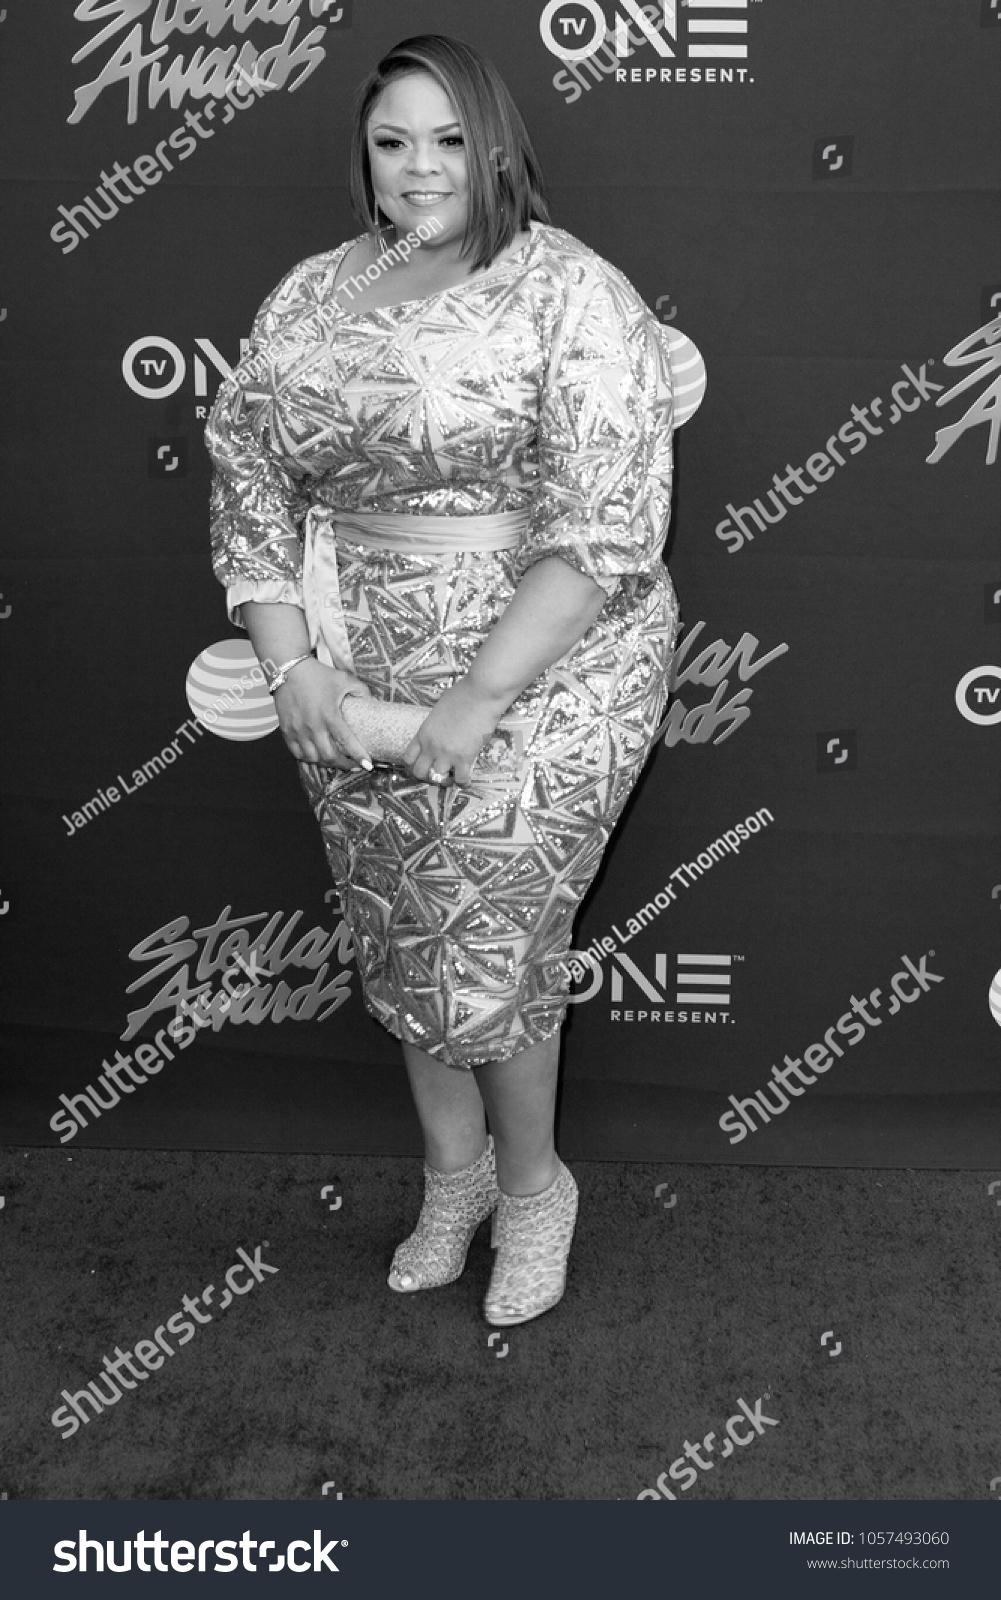 Maria Tucci,Moira Brooker (born 1957) Hot picture Manilyn Reynes (b. 1972),Kanokkorn Jaicheun